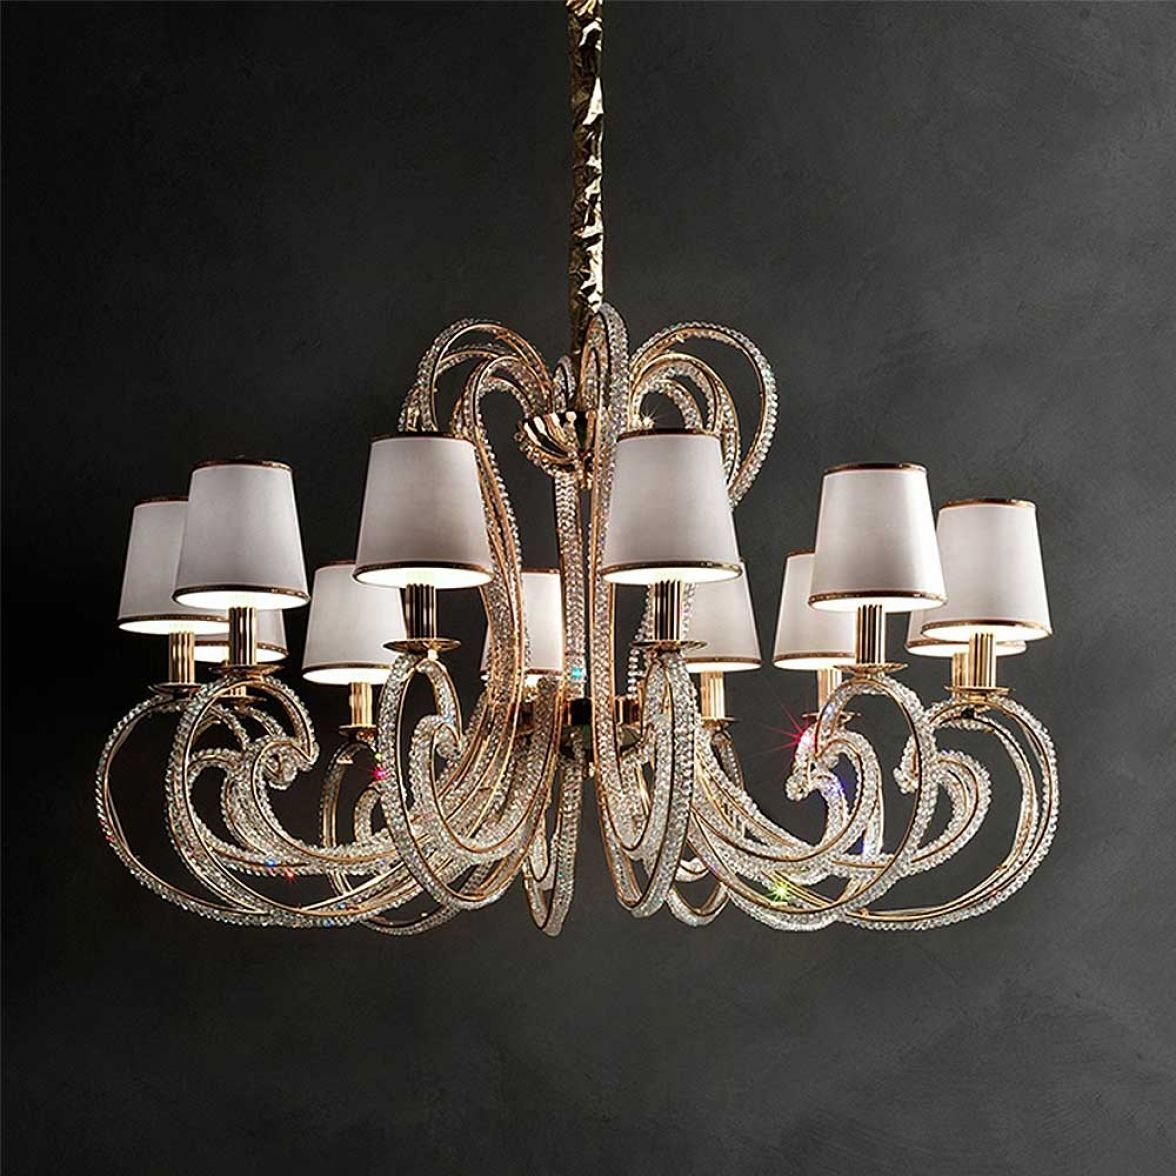 CRISTALRY GOLD chandelier